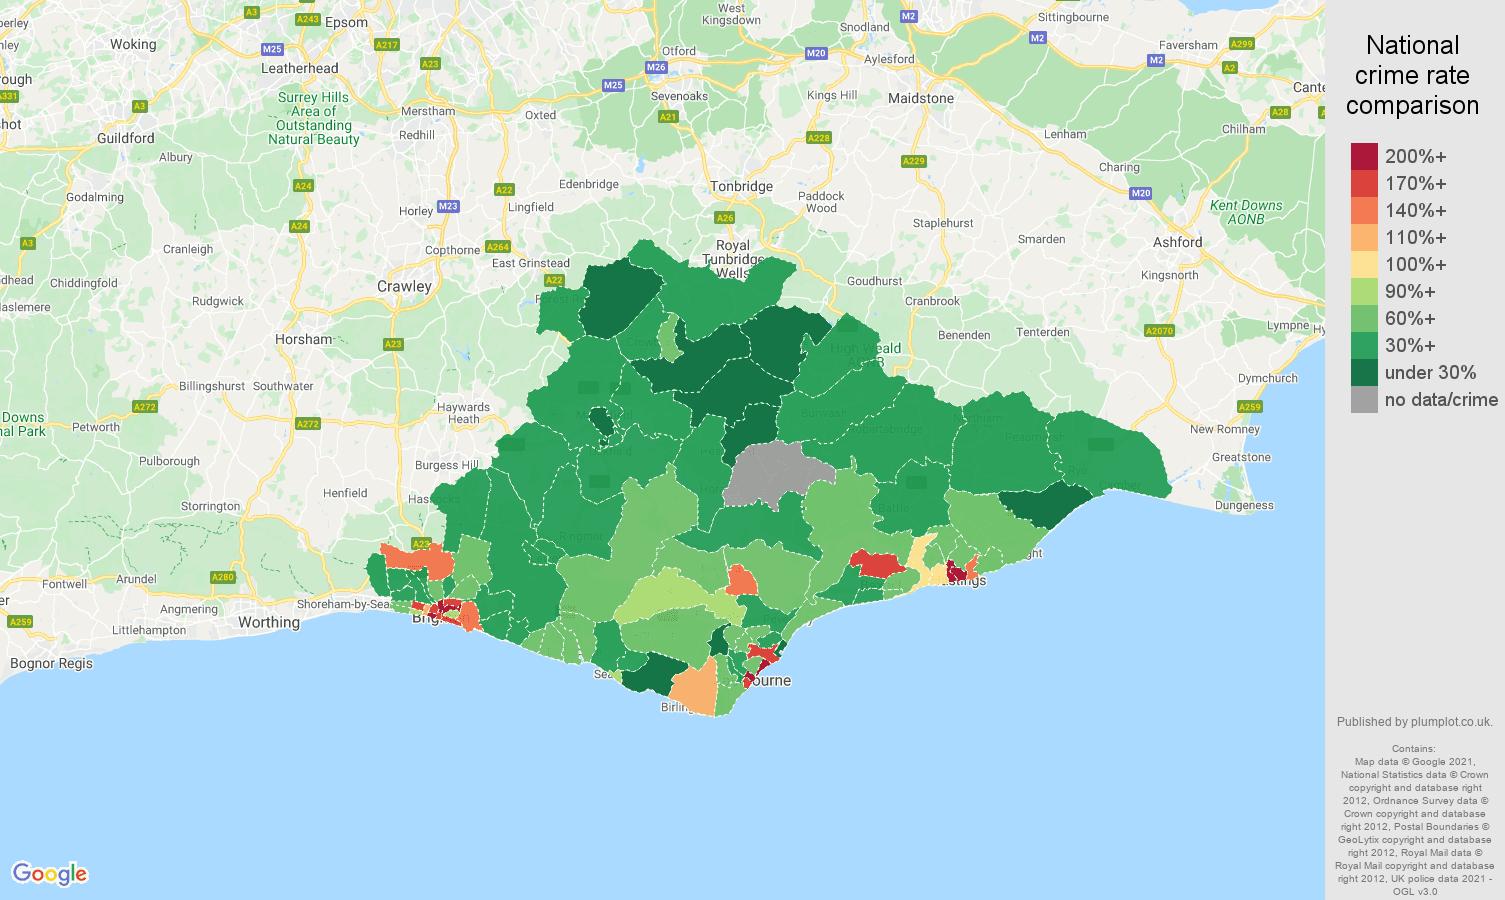 East Sussex drugs crime rate comparison map